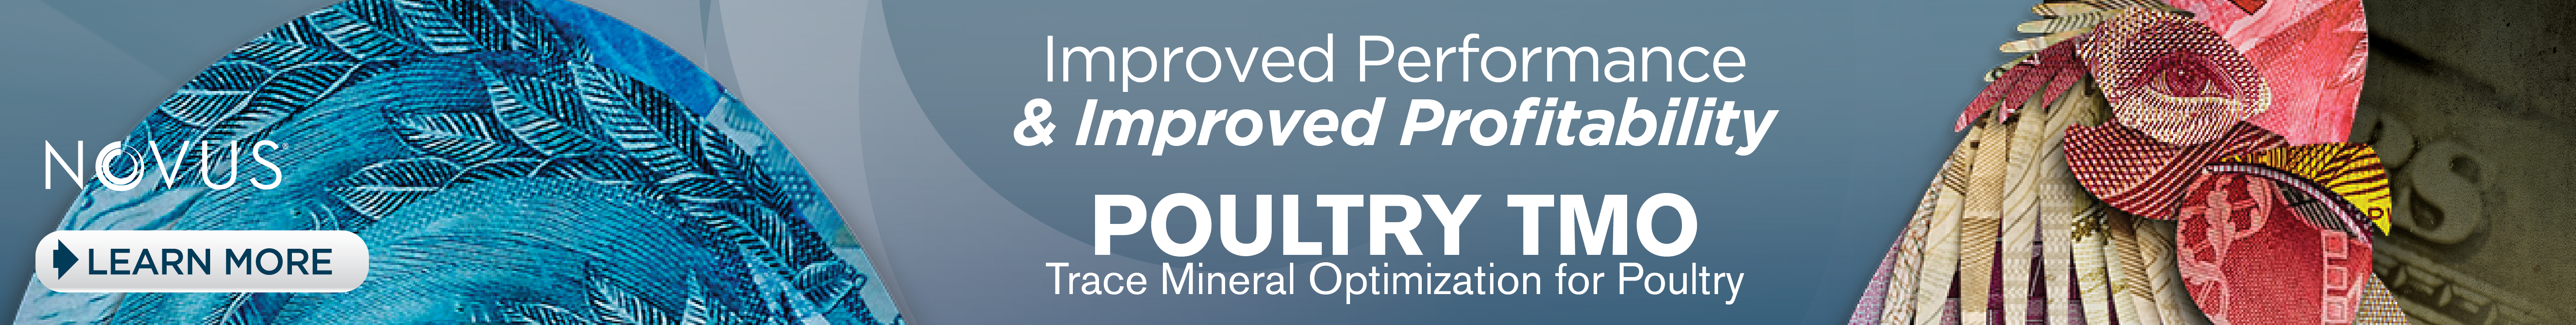 Novus2017TGTF -Poultry TMO